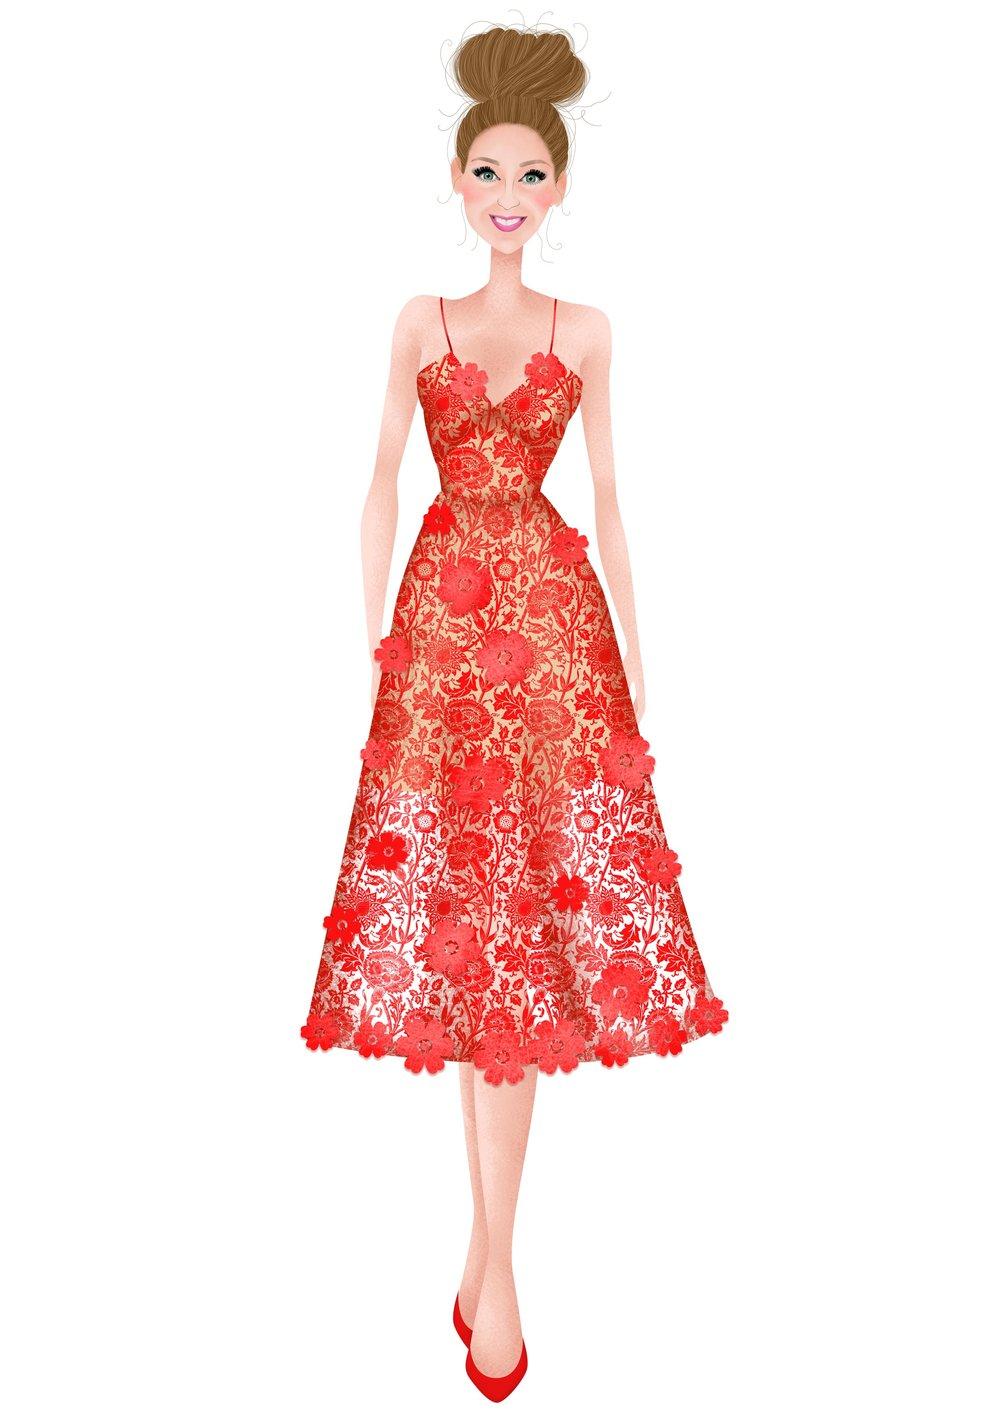 SELF PORTRAIT - DRESS 3 - A4.jpg